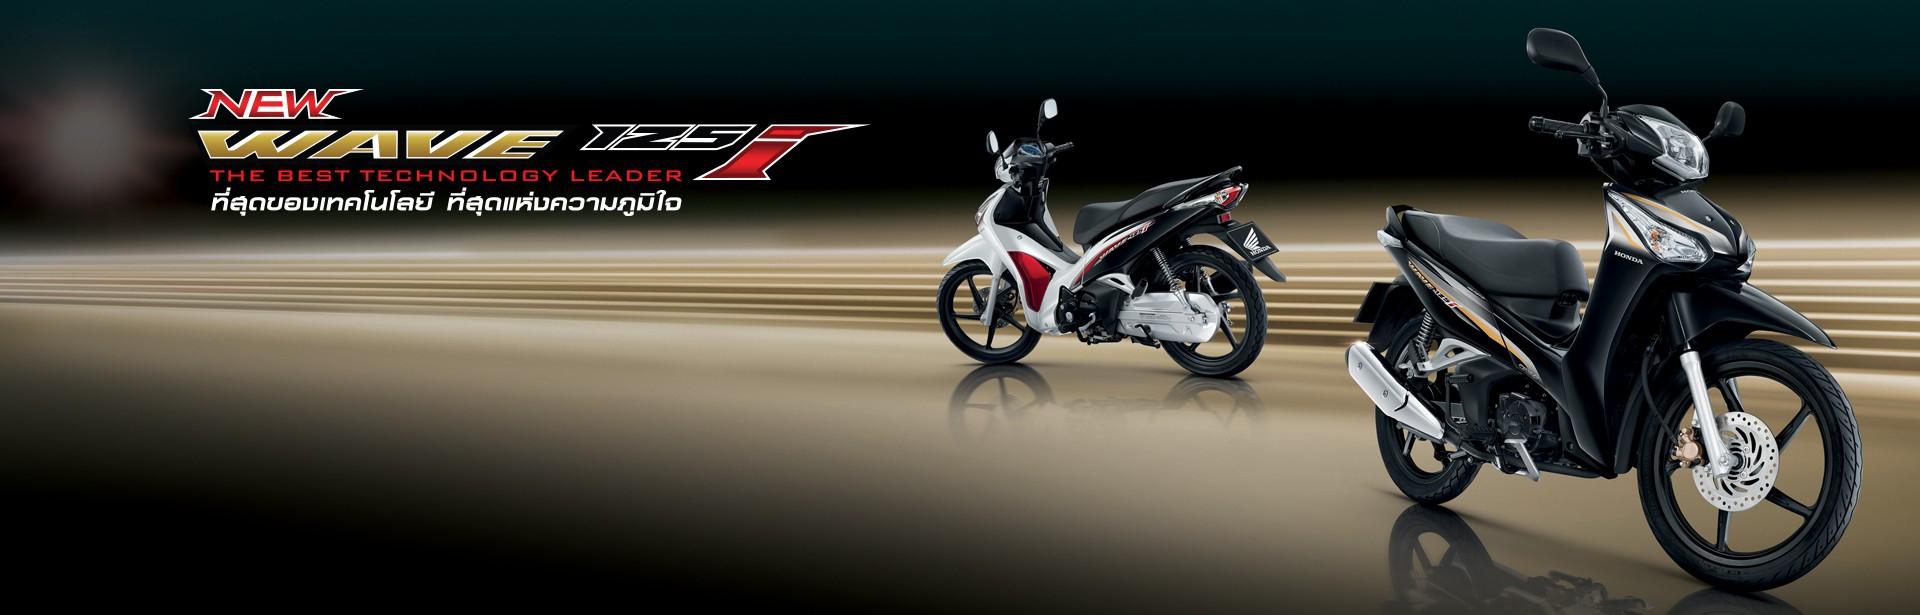 Honda-Motorcycle-มอเตอร์ไซค์-ฮอนด้า-wave125i-2015